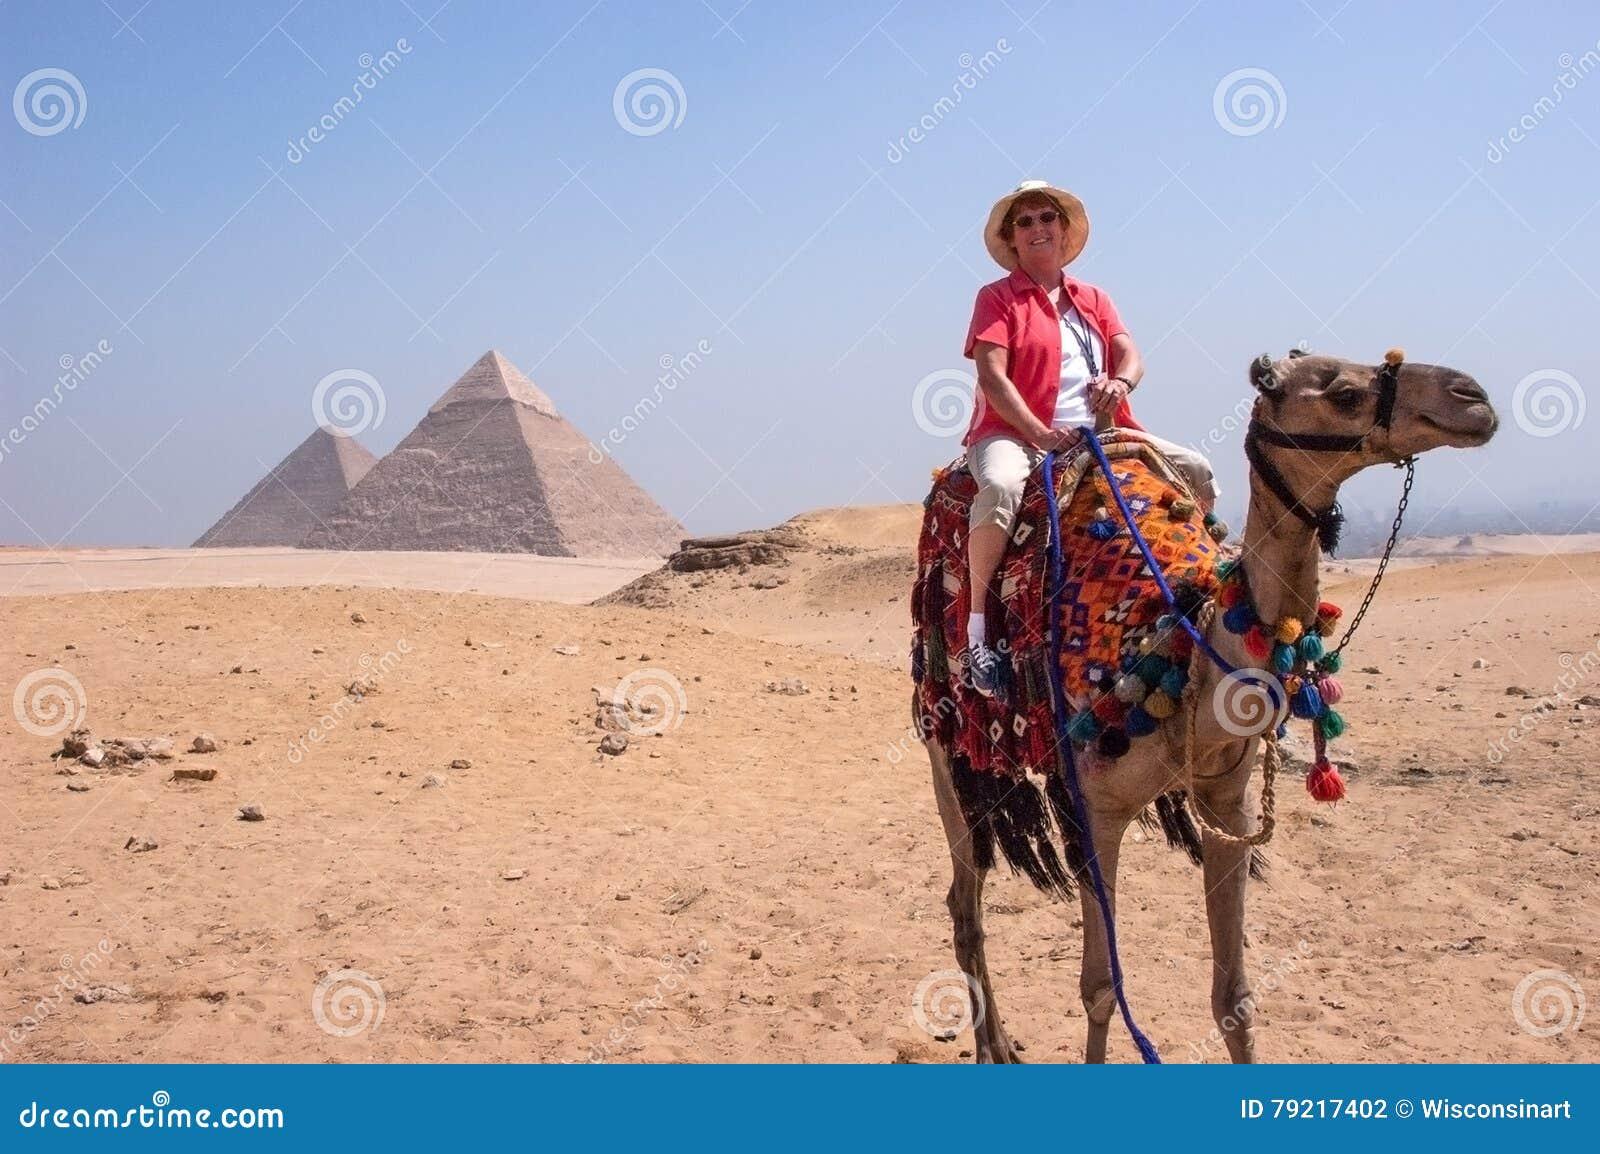 Tourist, Egypt Pyramid, Travel, Vacation